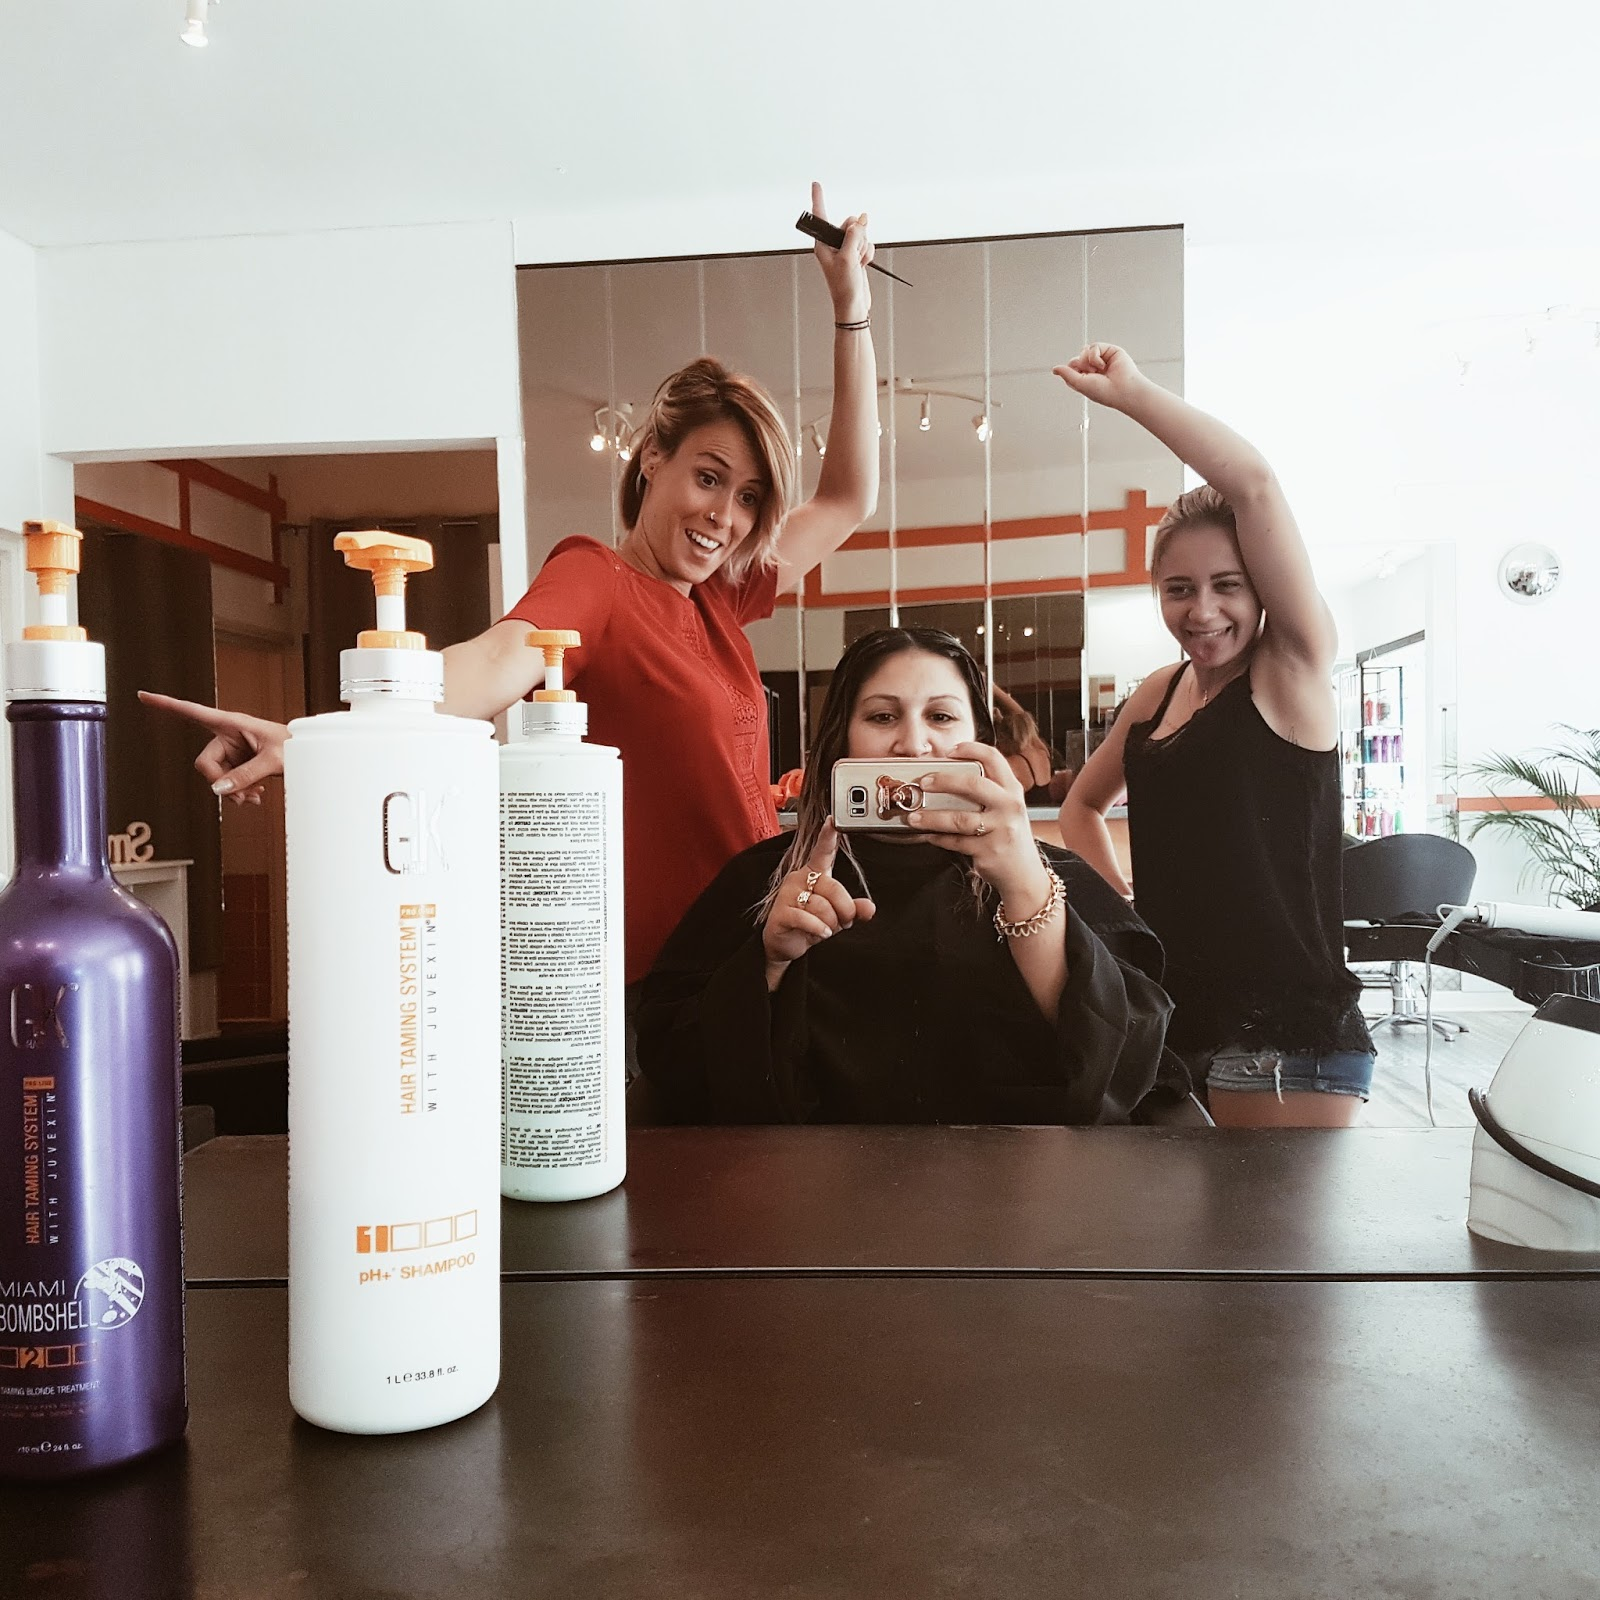 coiffeur-salon-diminutif-carpentras-lissage-bresilien-gkhair-mama-syca-beaute